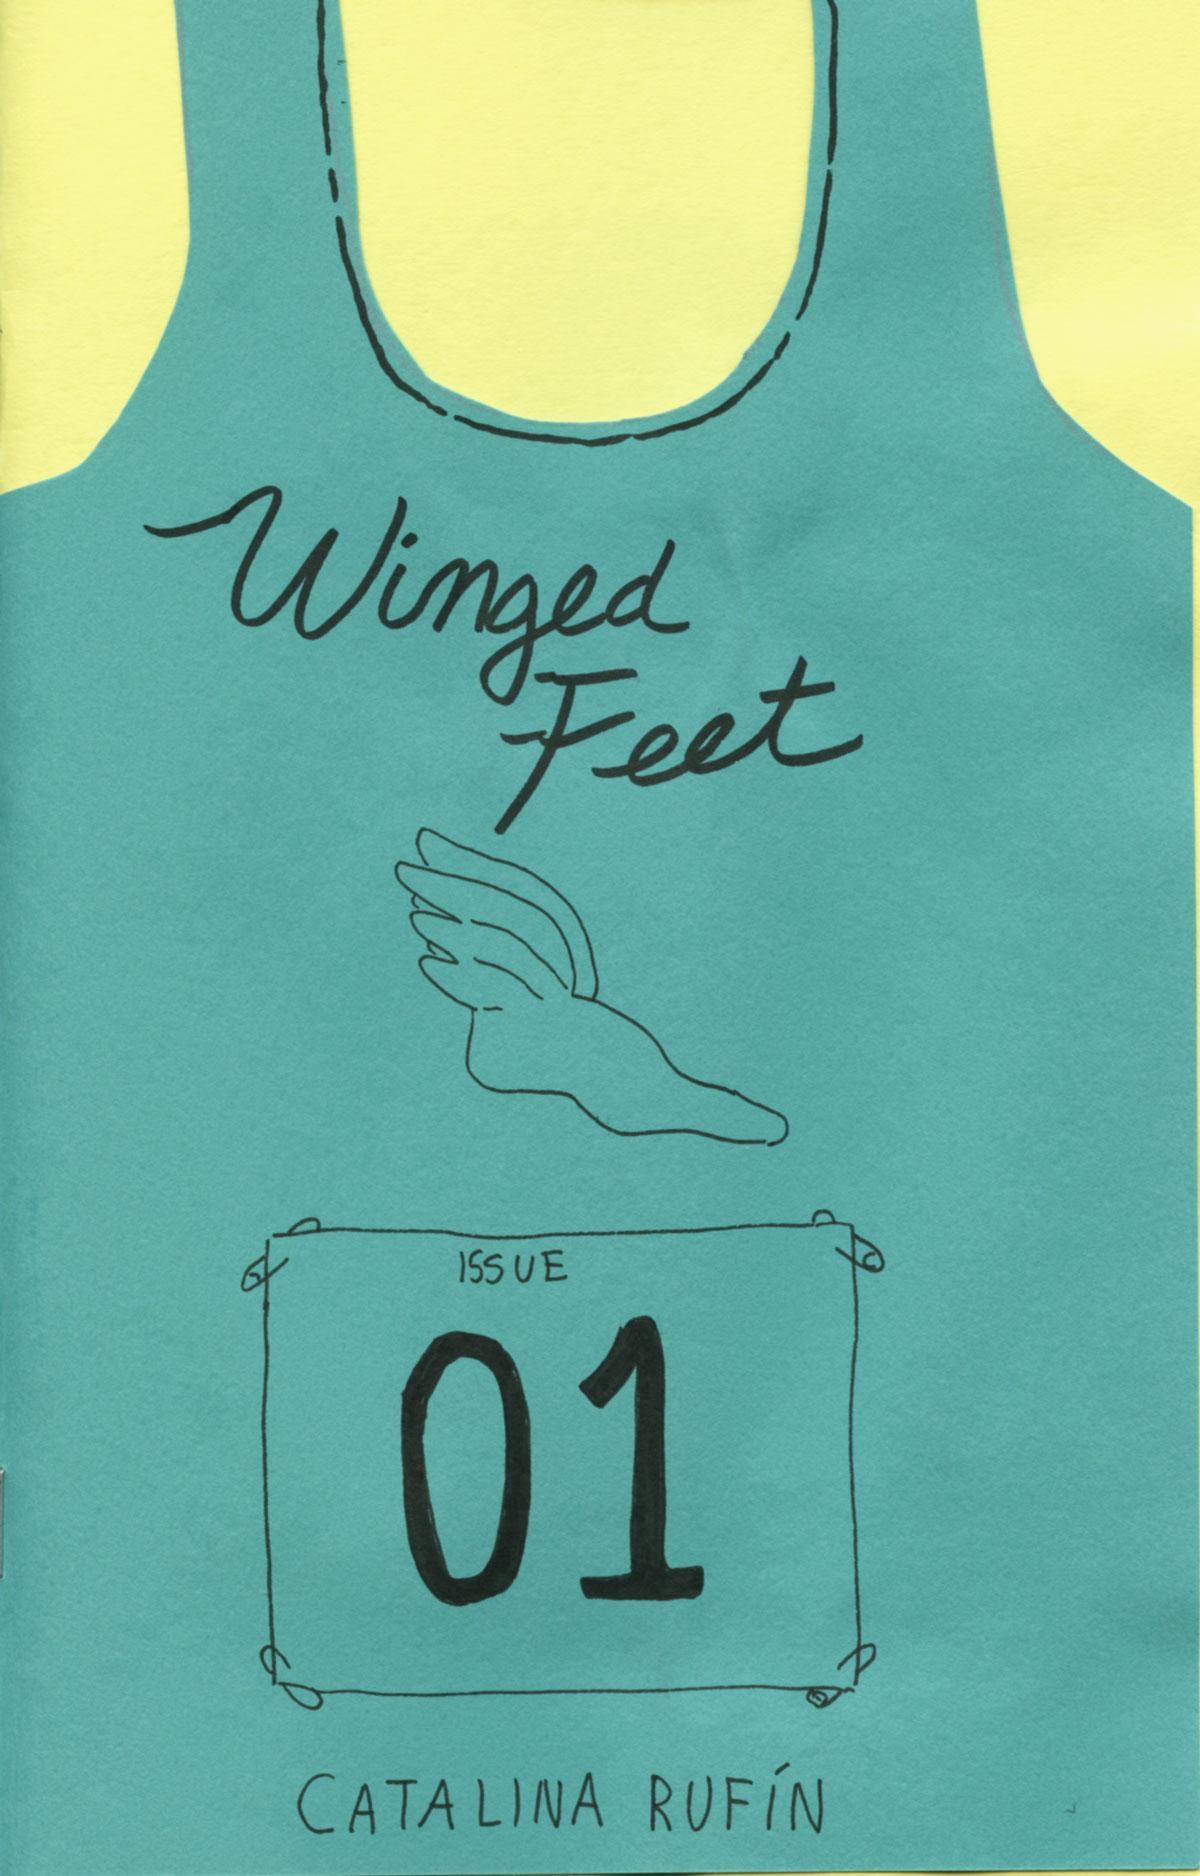 Winged Feet No. 1 by Catalina Rufín